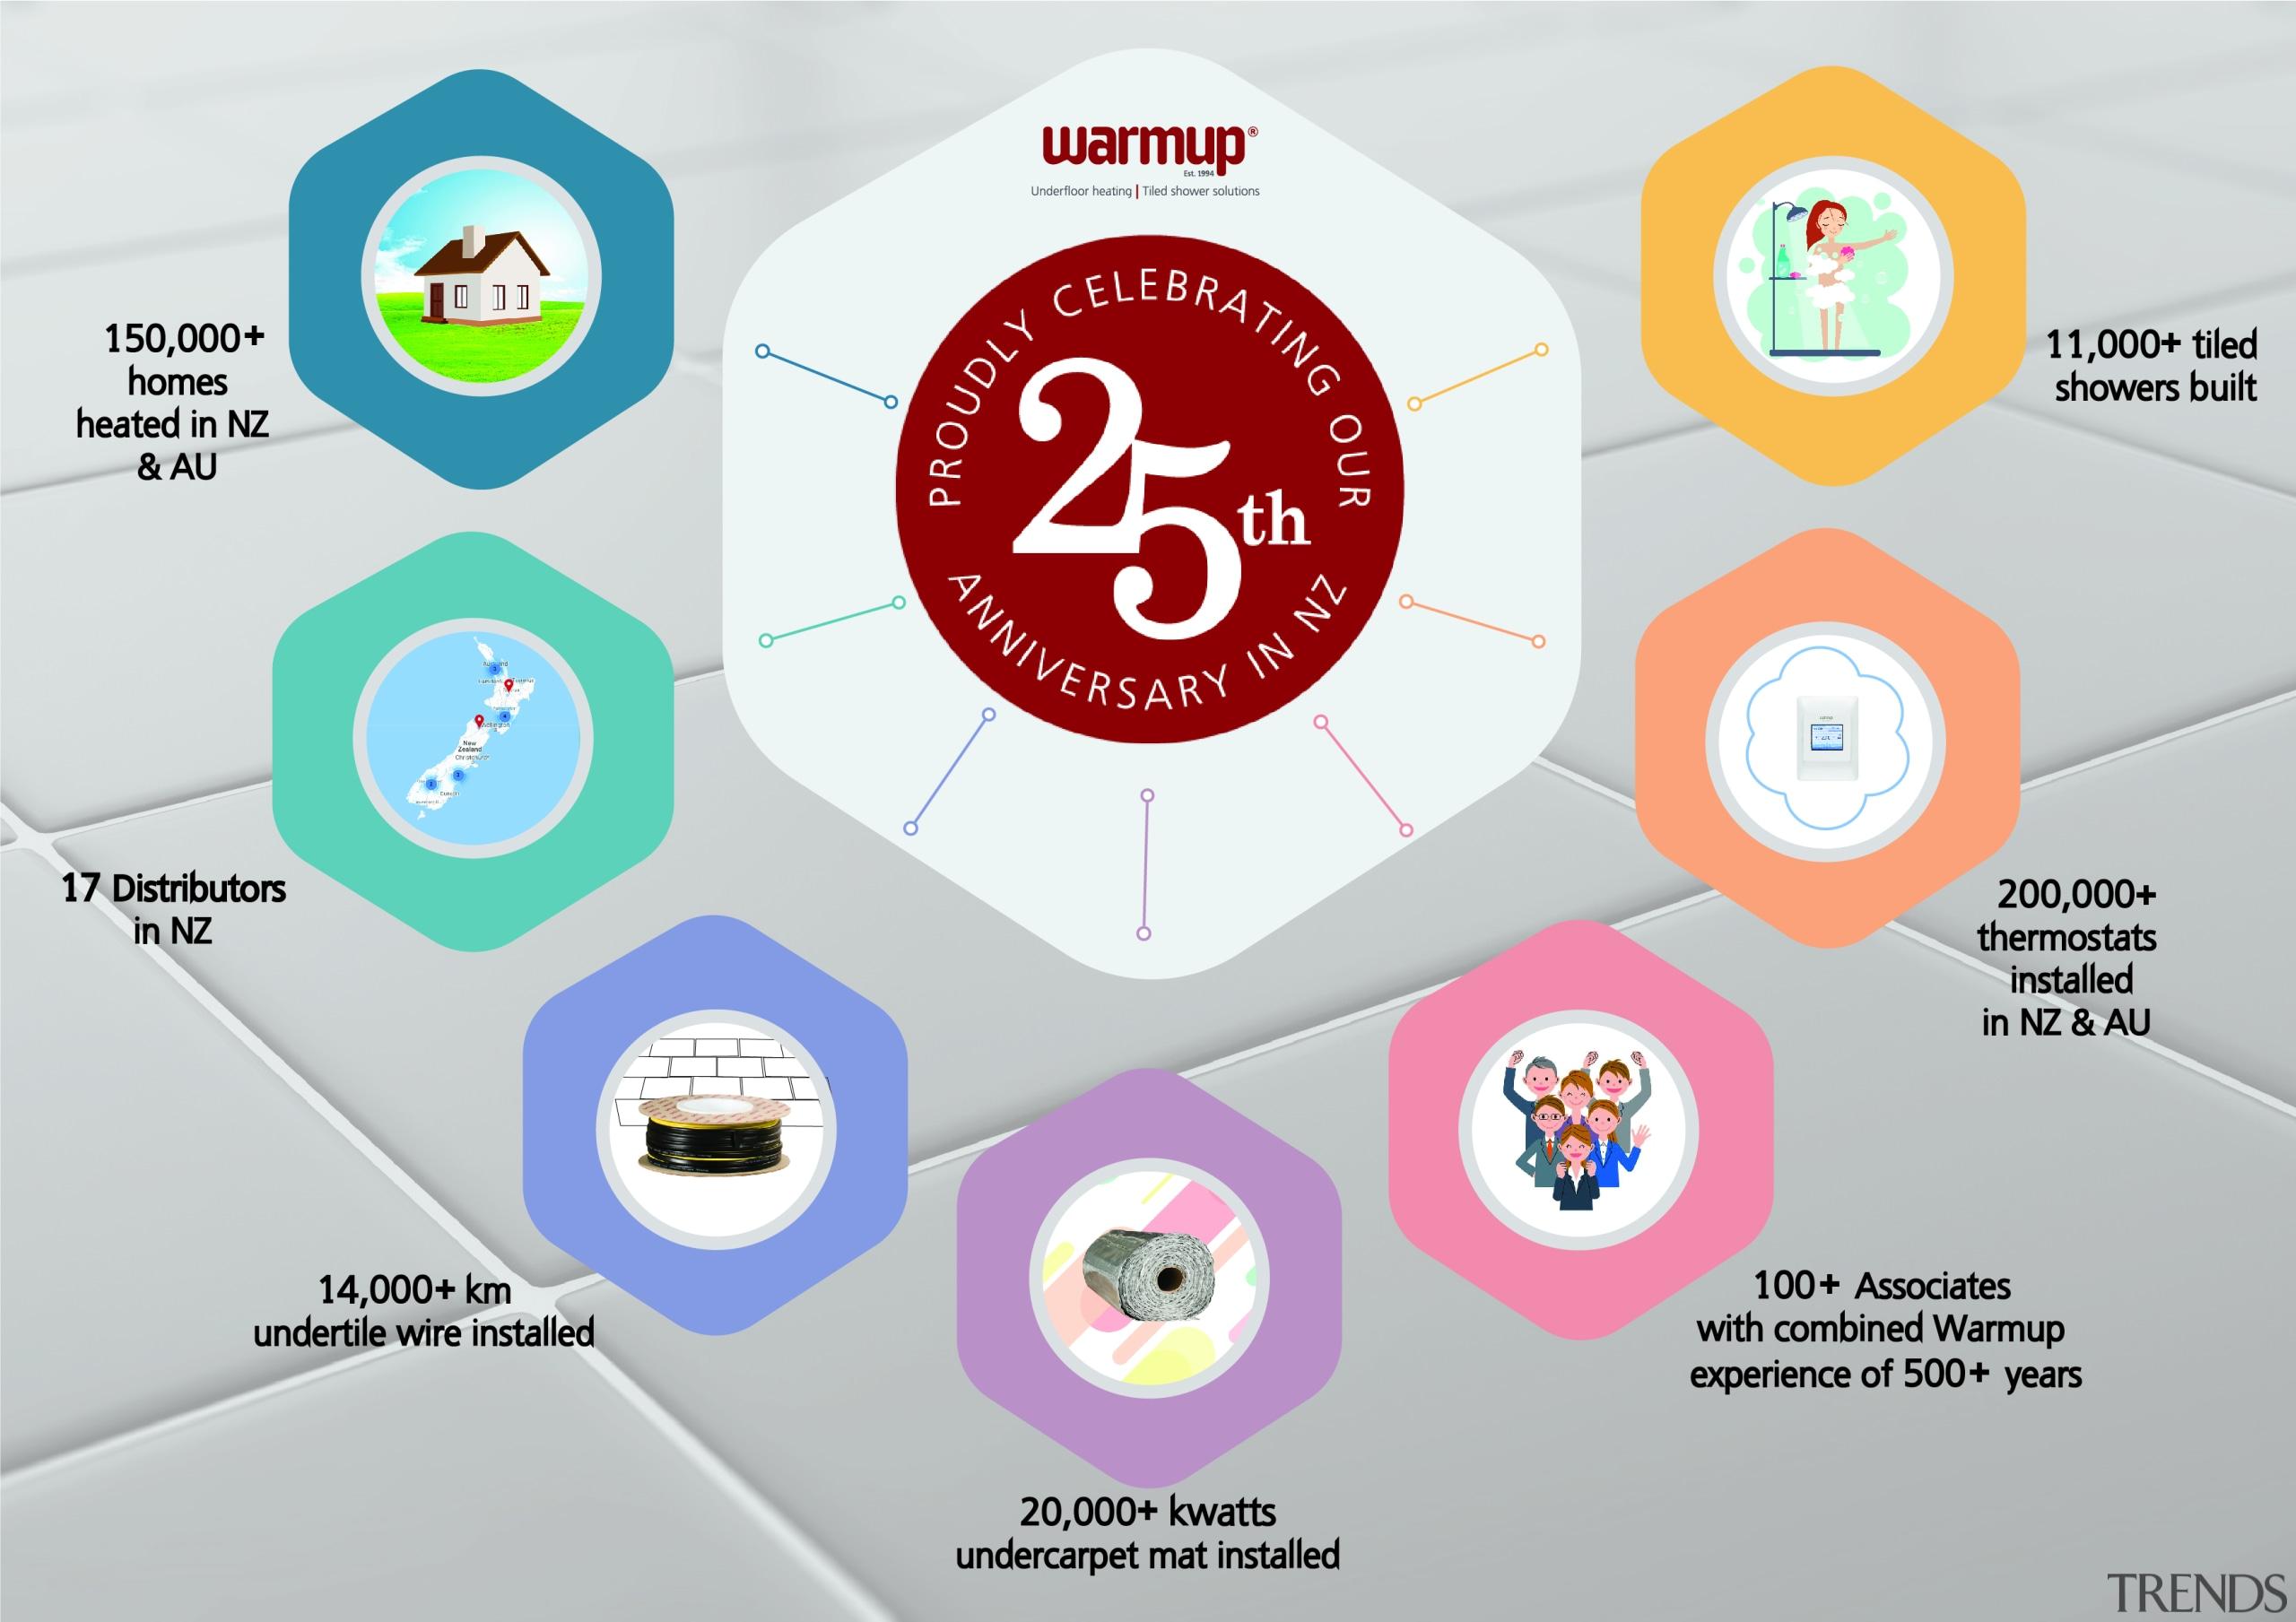 Artwork - circle | diagram | graphic design circle, diagram, graphic design, graphics, illustration, logo, product, white